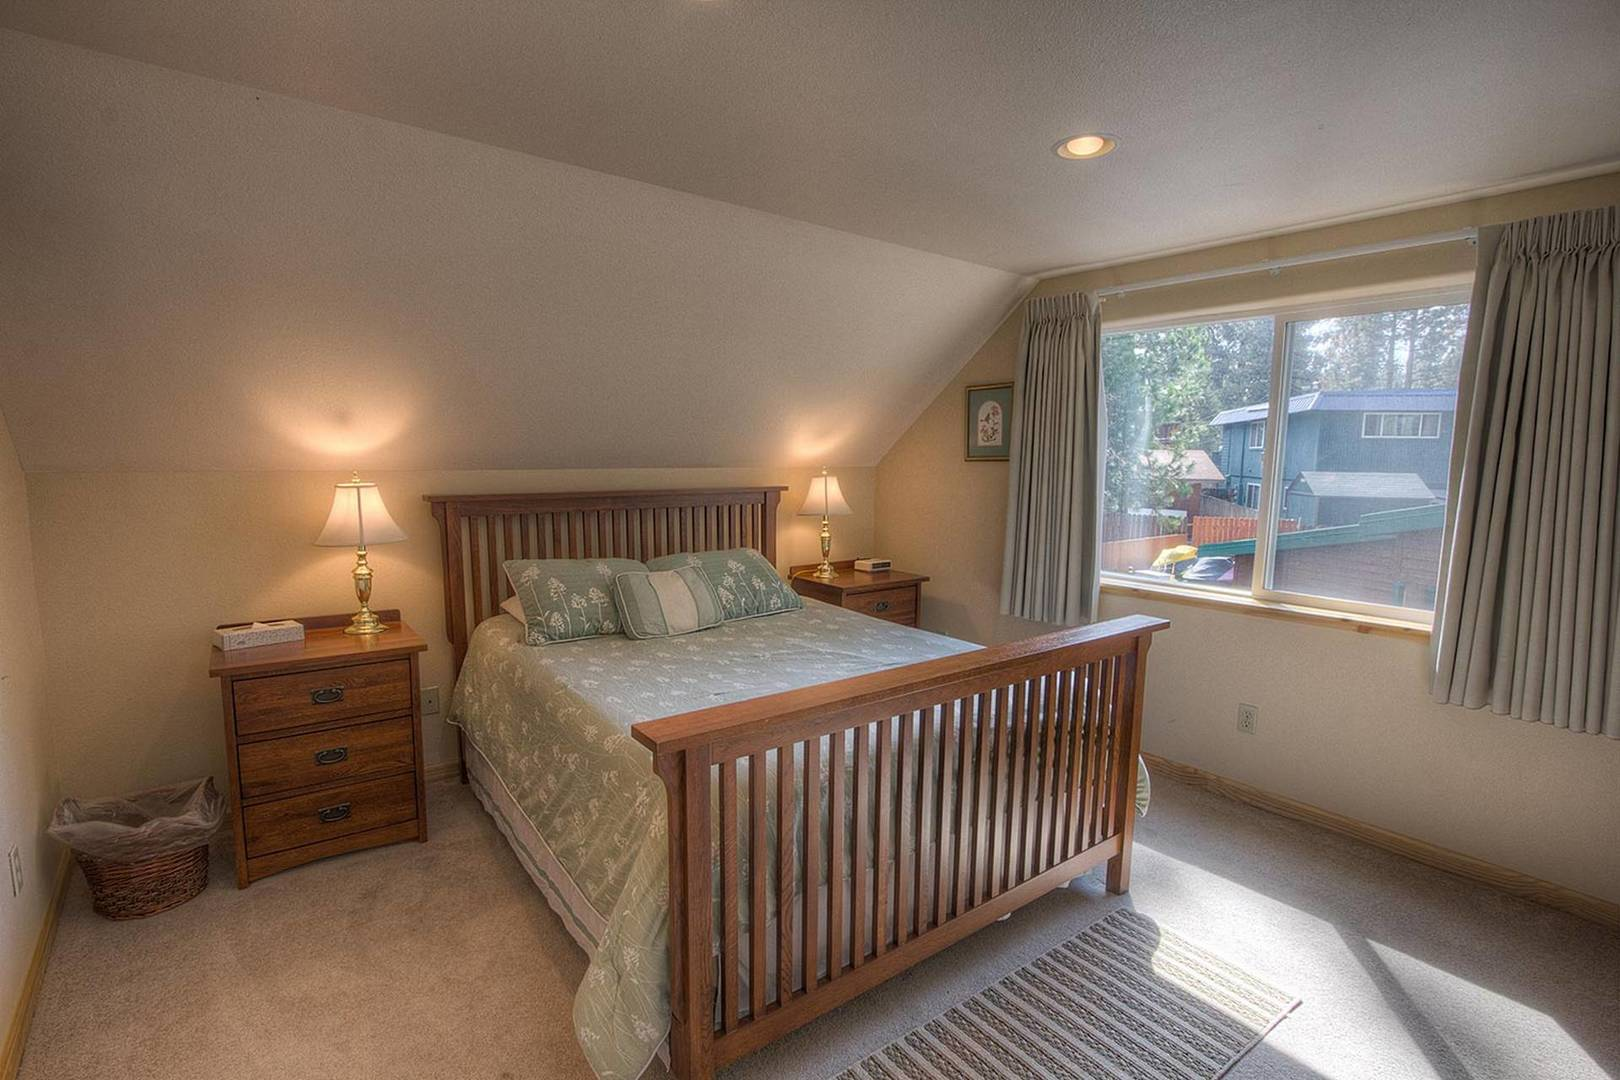 cyh0814 bedroom